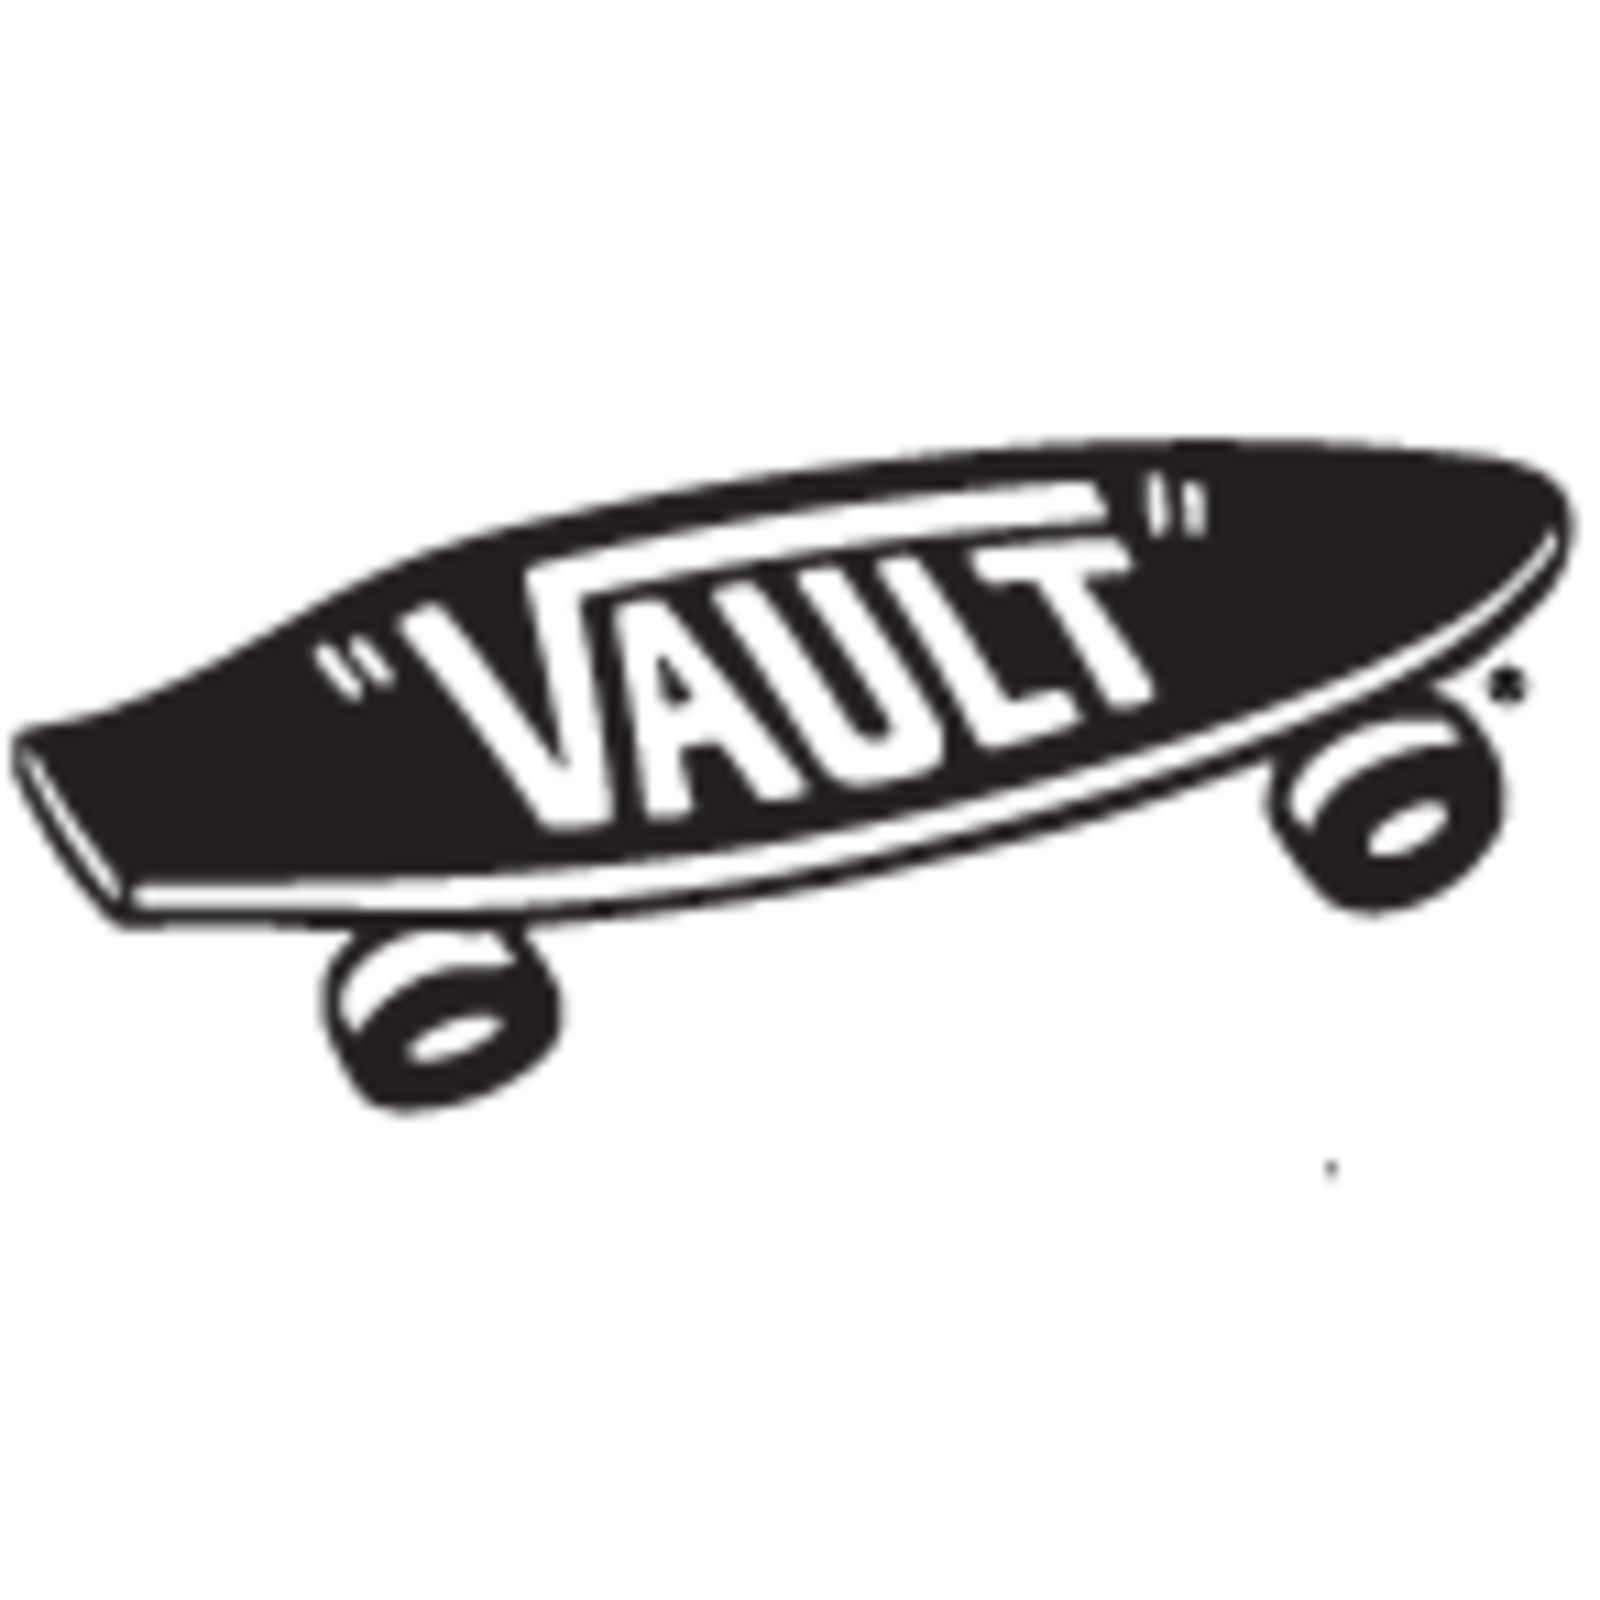 VAULT by VANS (Изображение 1)